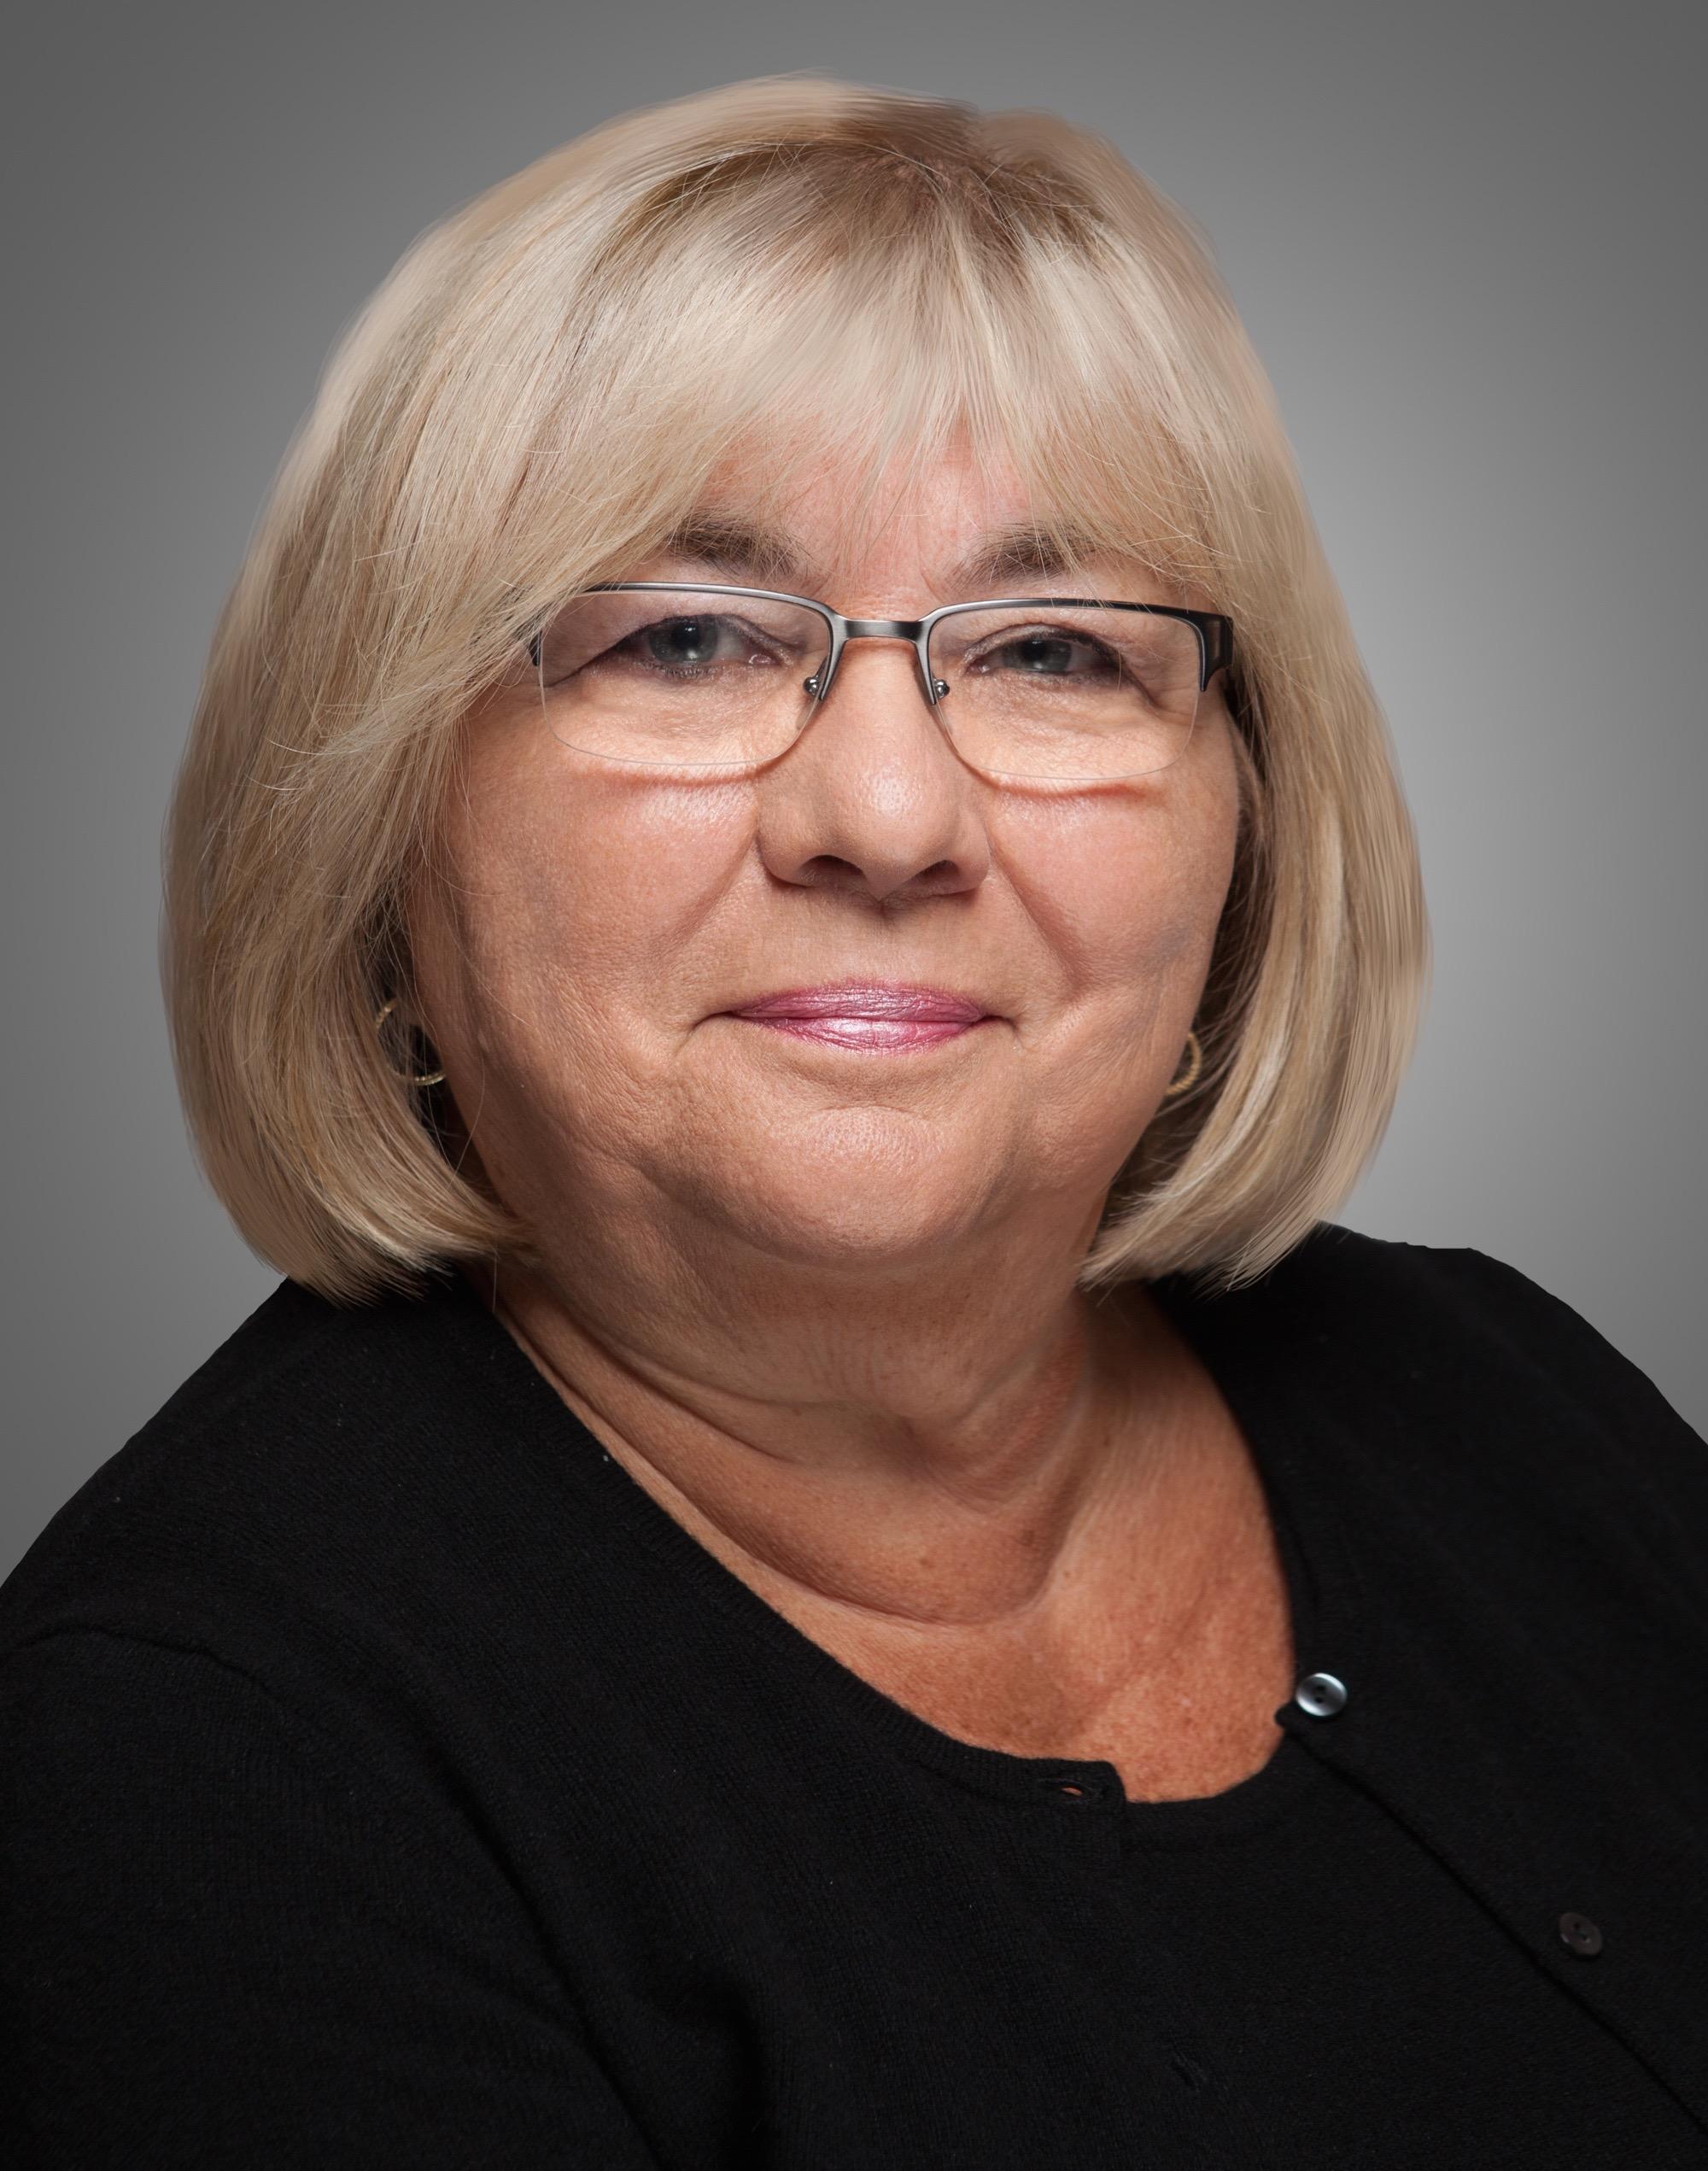 Patricia Mohn